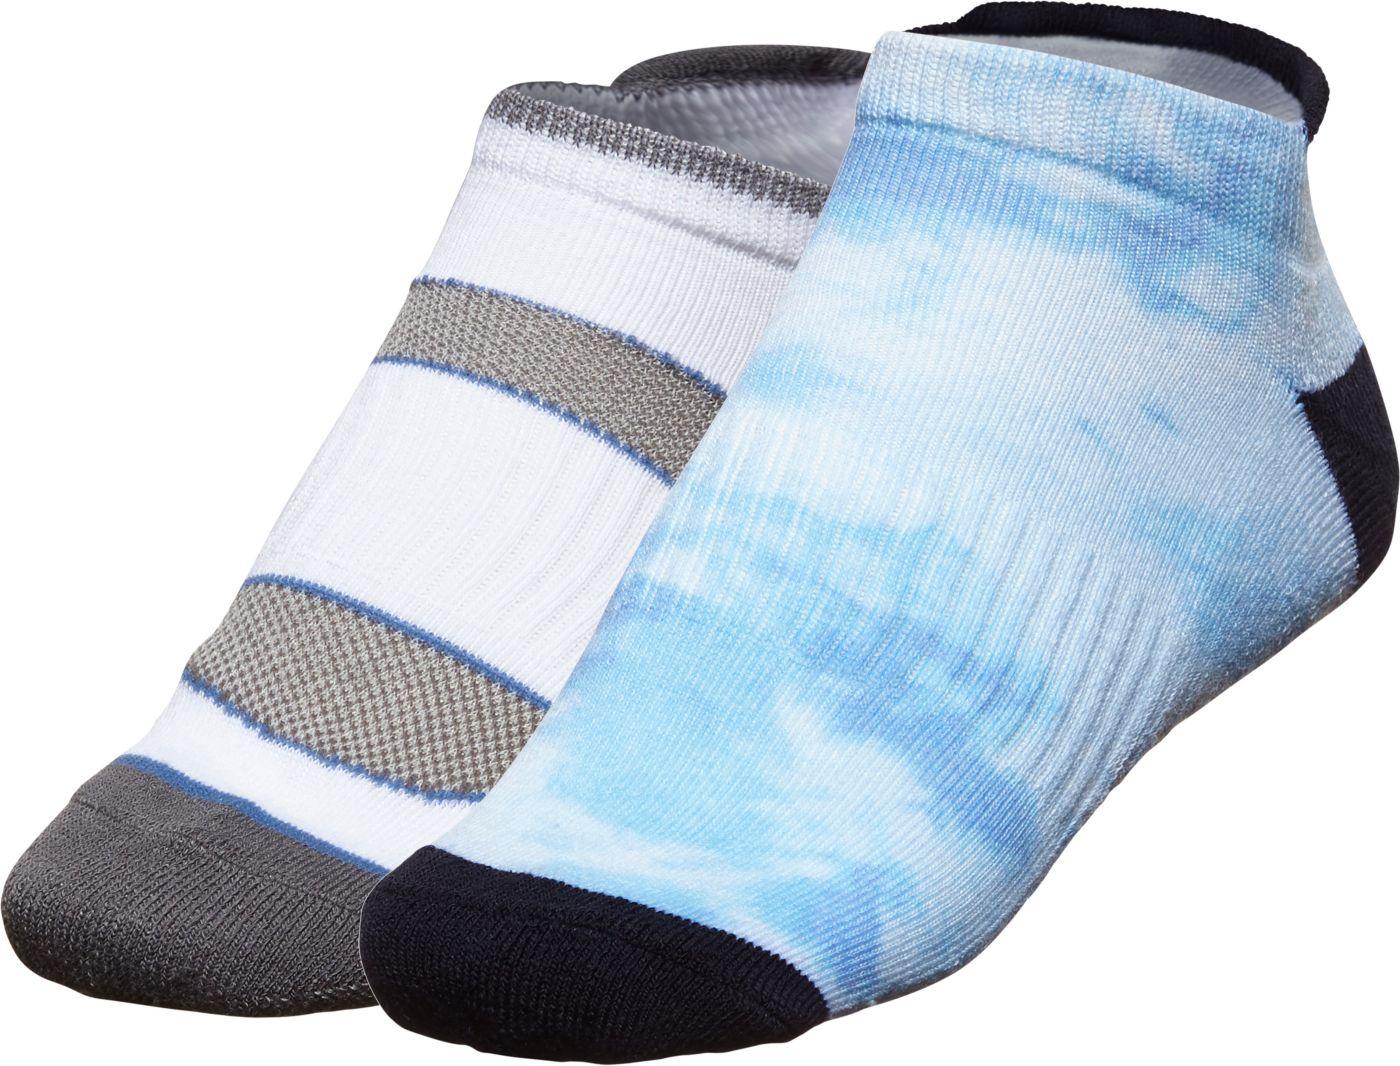 Alpine Design Women's Explorer Low Cut Tab Socks – 2 Pack